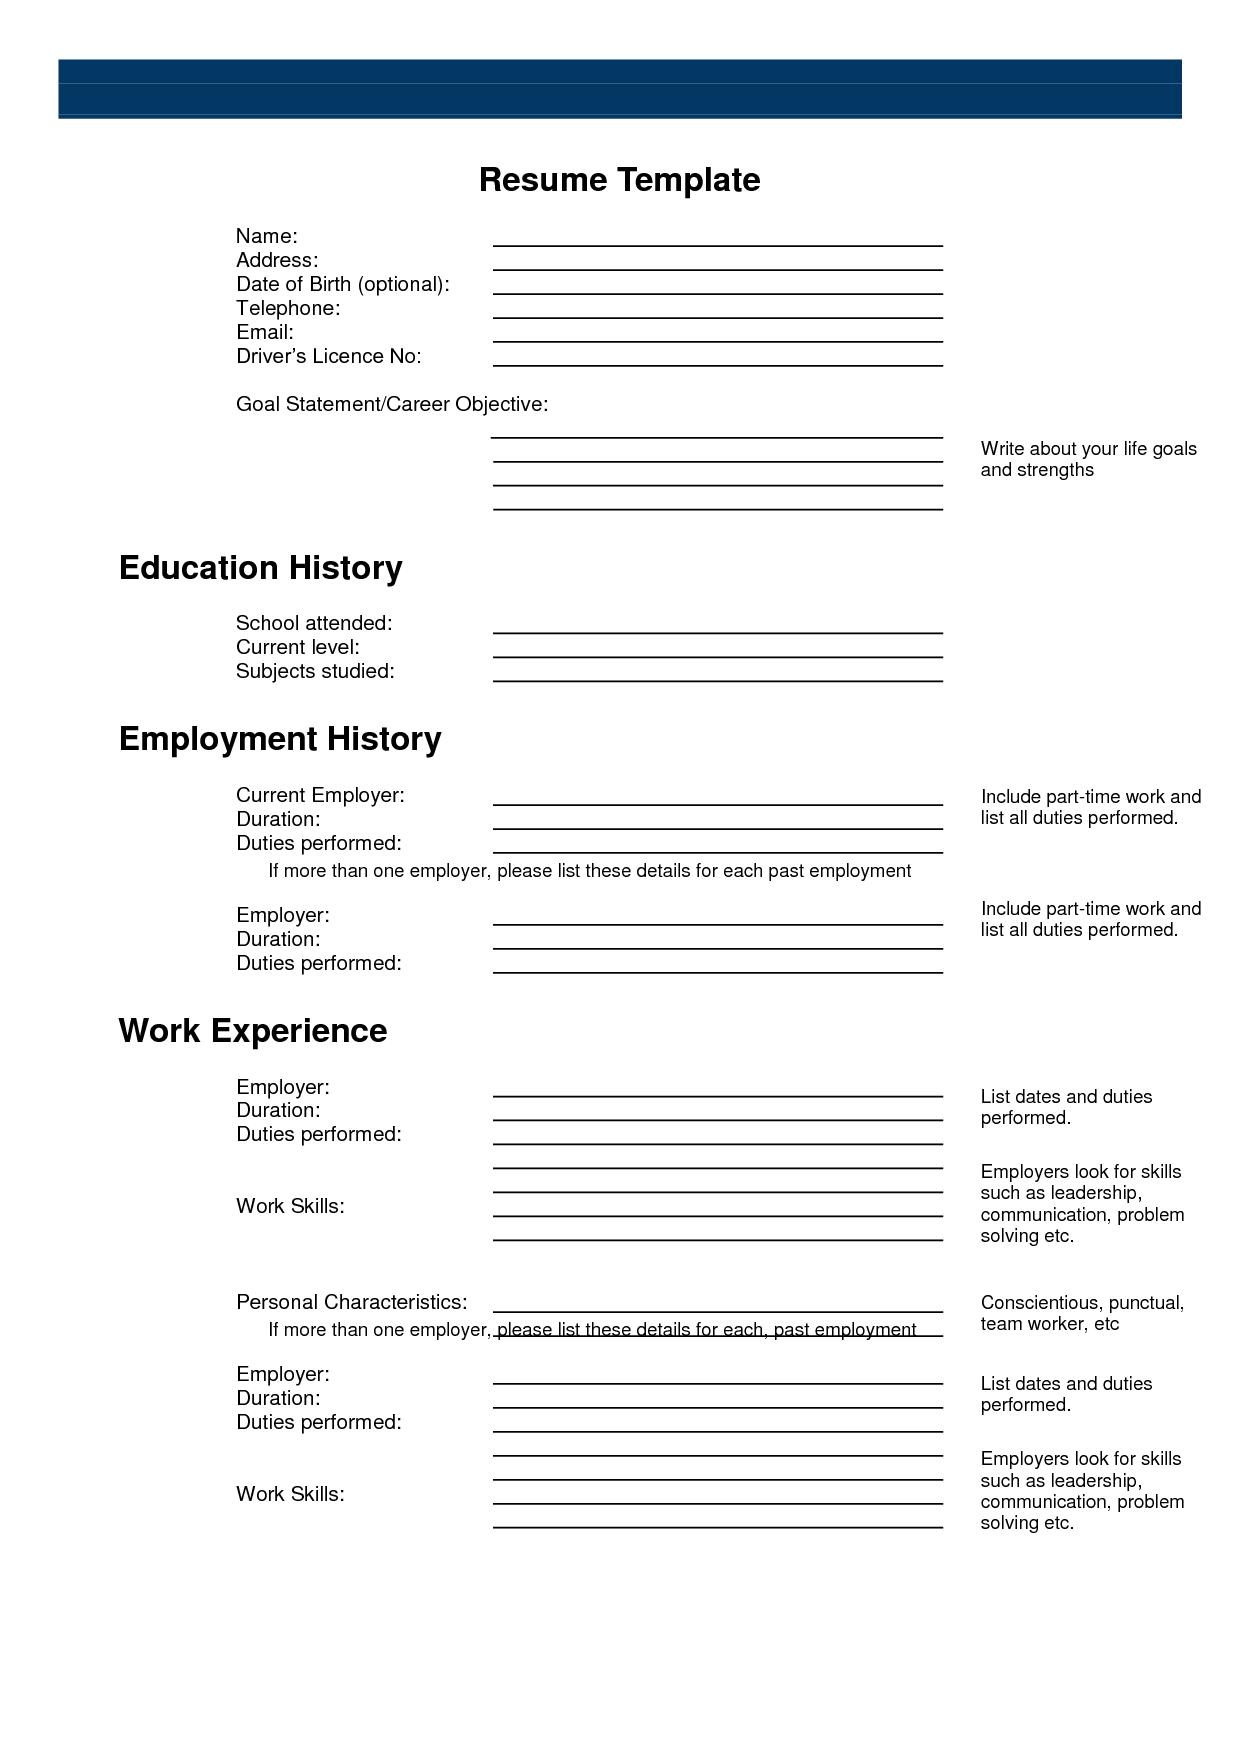 Free Printable Sample Resume Templates